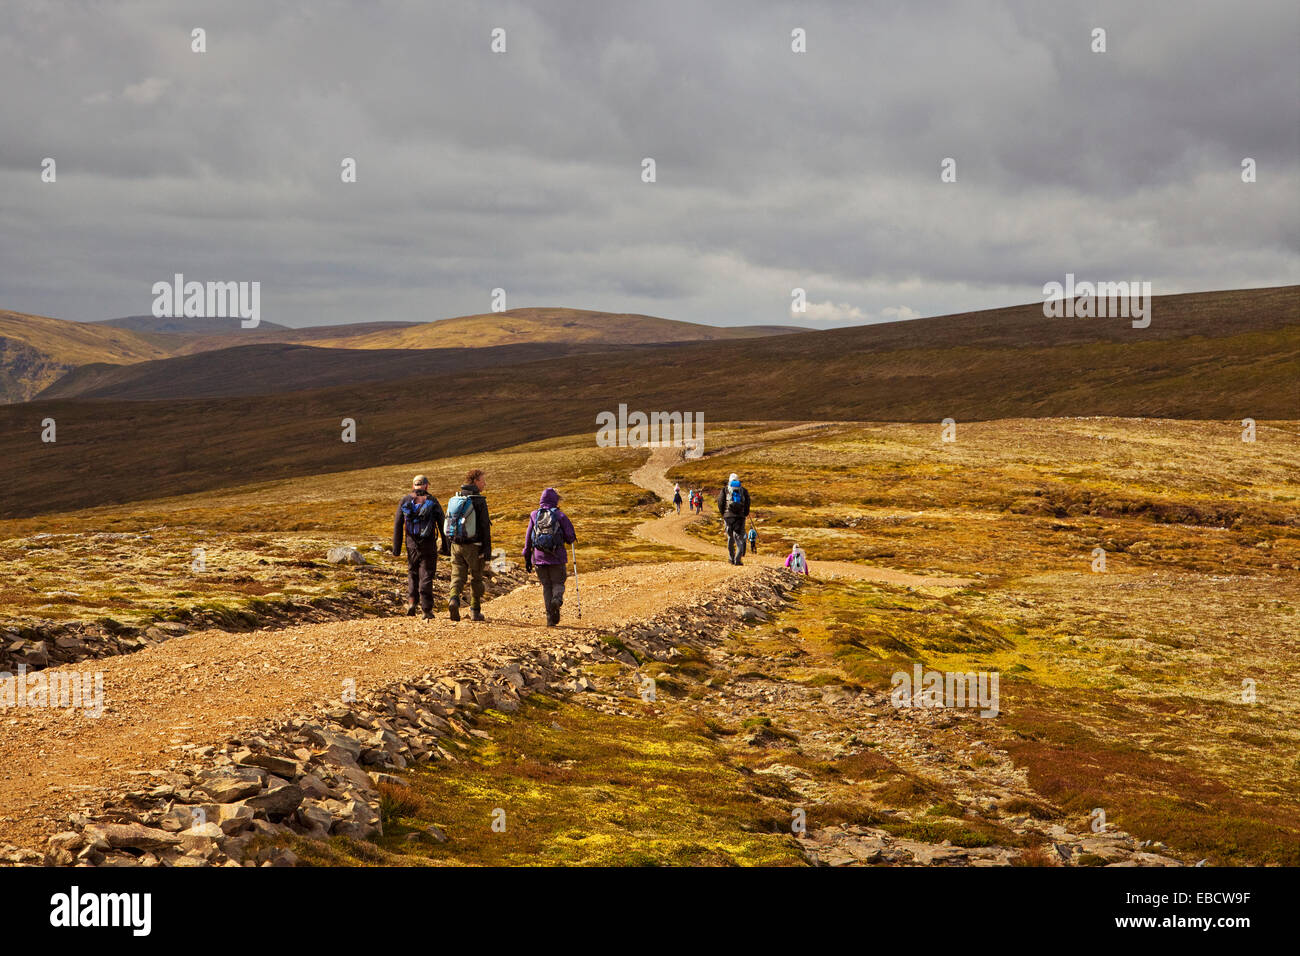 Walkers ascending Carn an Fhreiceadain near Kingussie - Stock Image